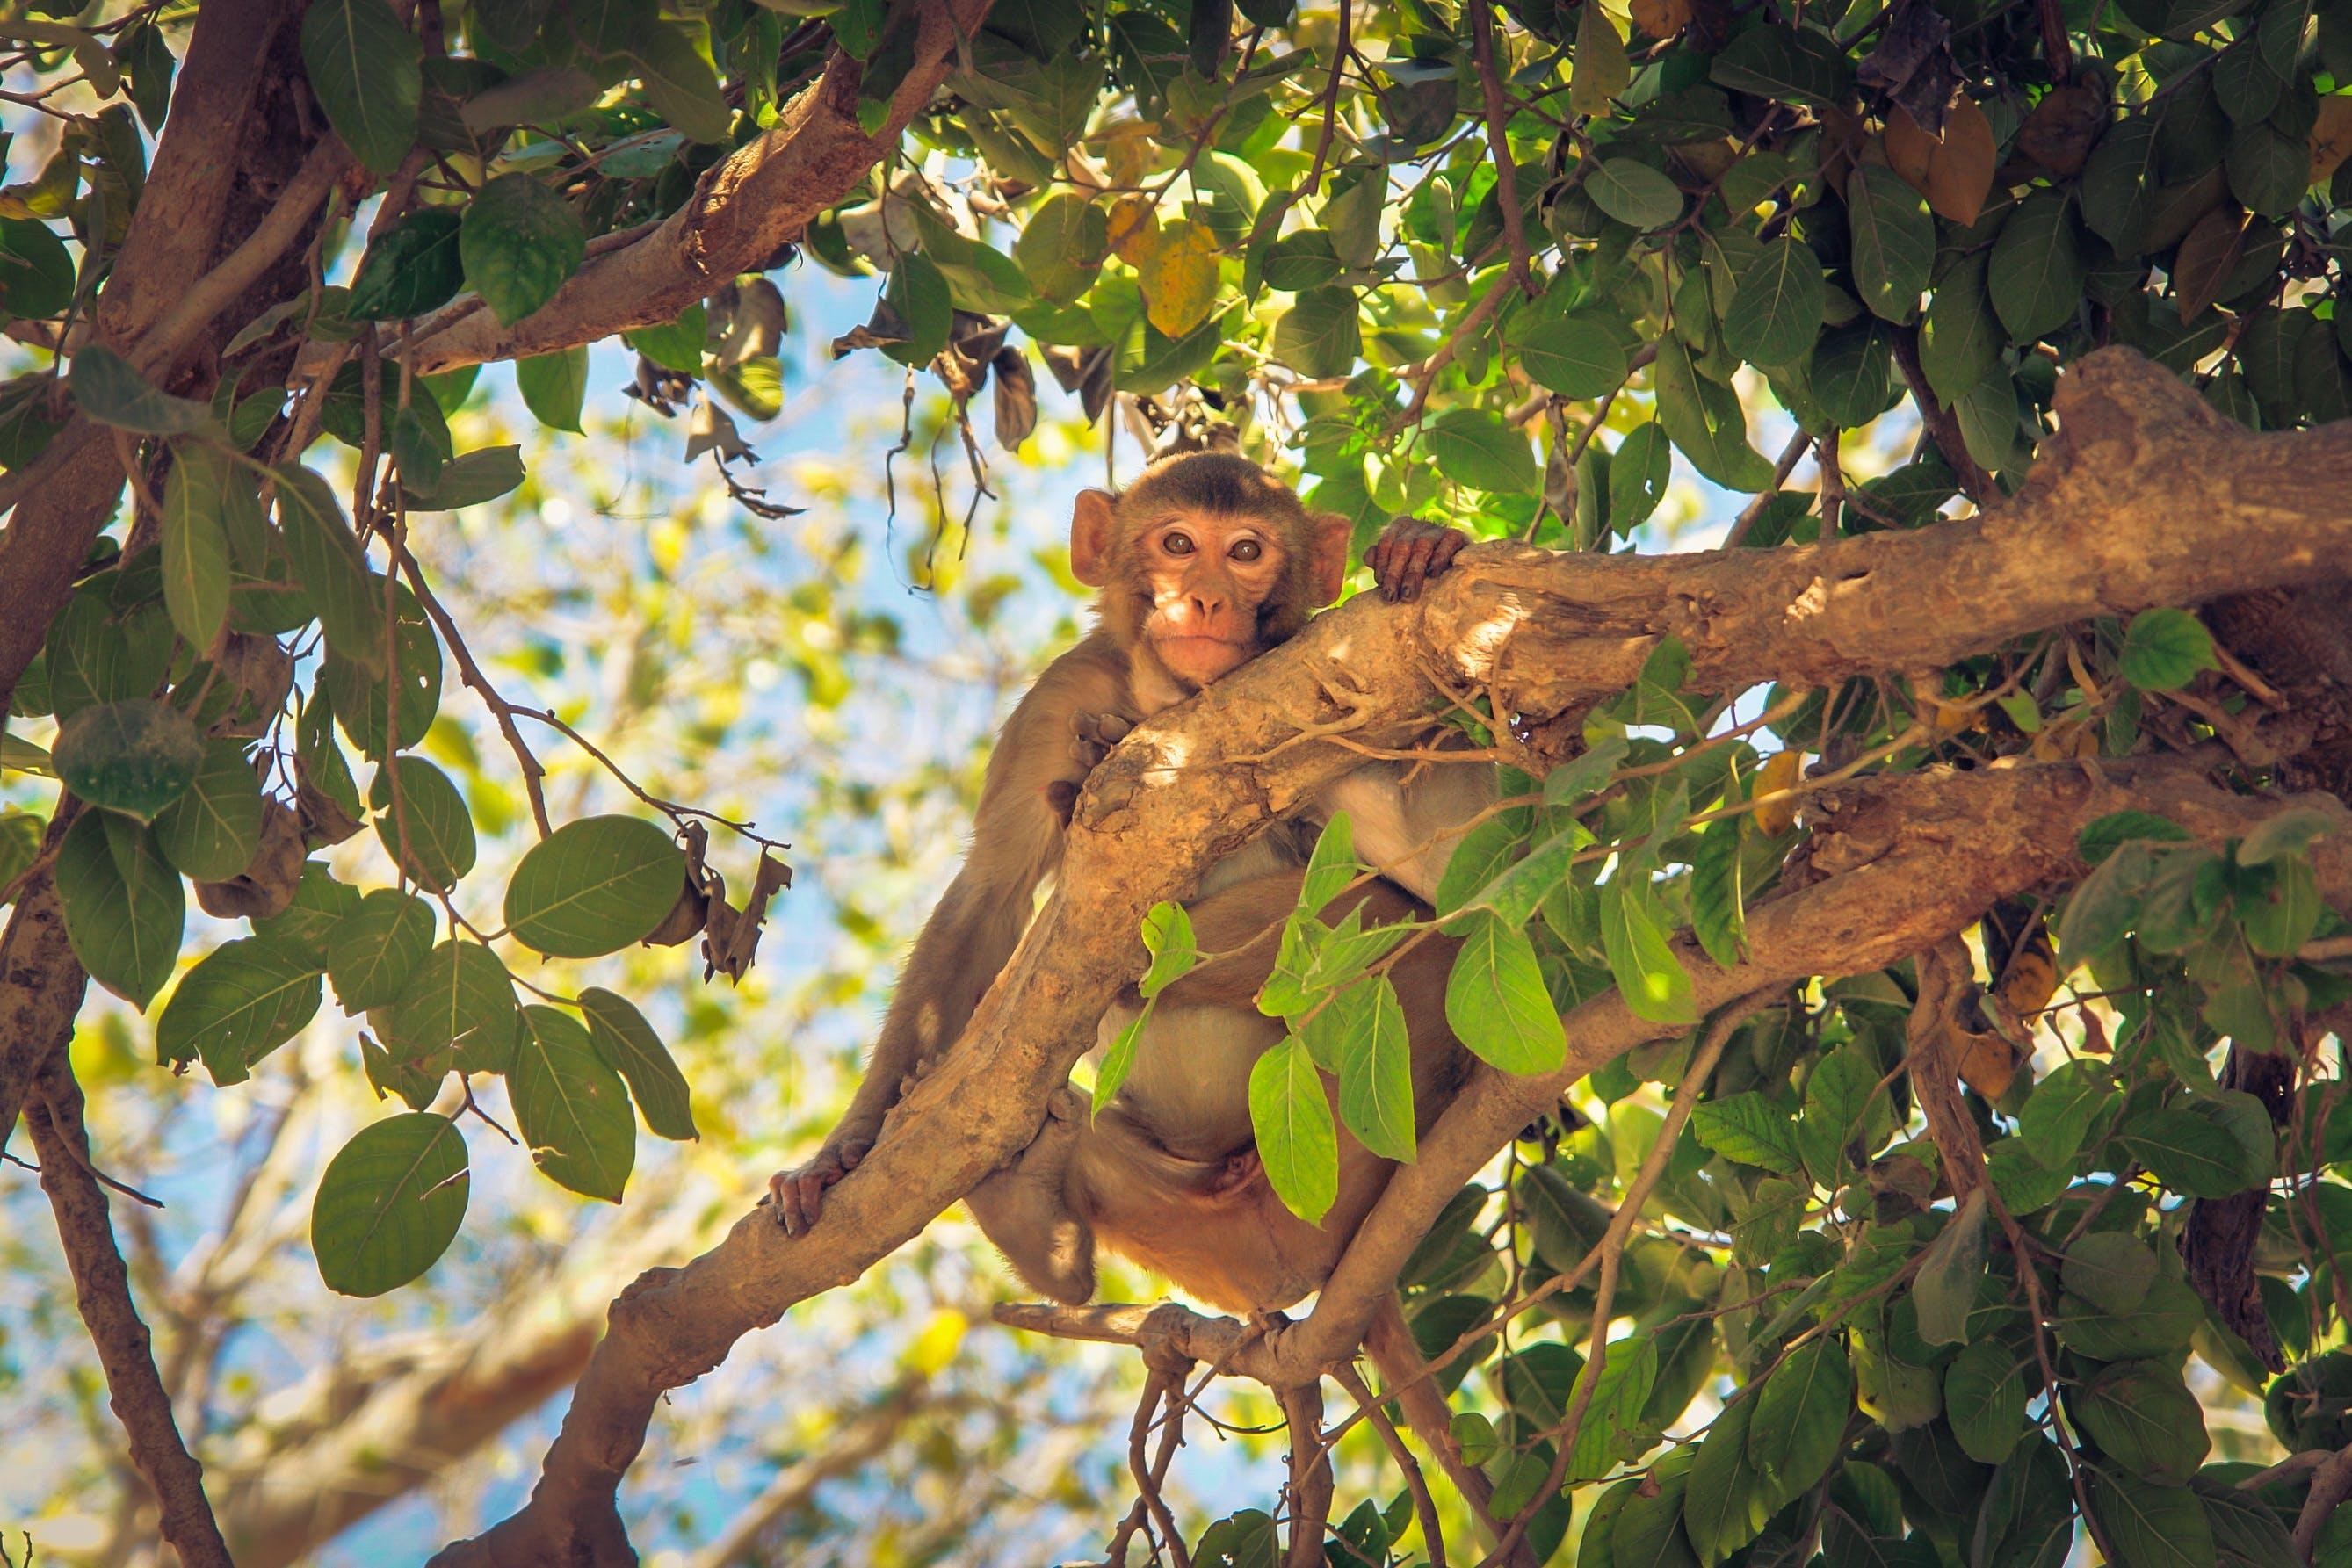 Free stock photo of nature, animal, cute, tree